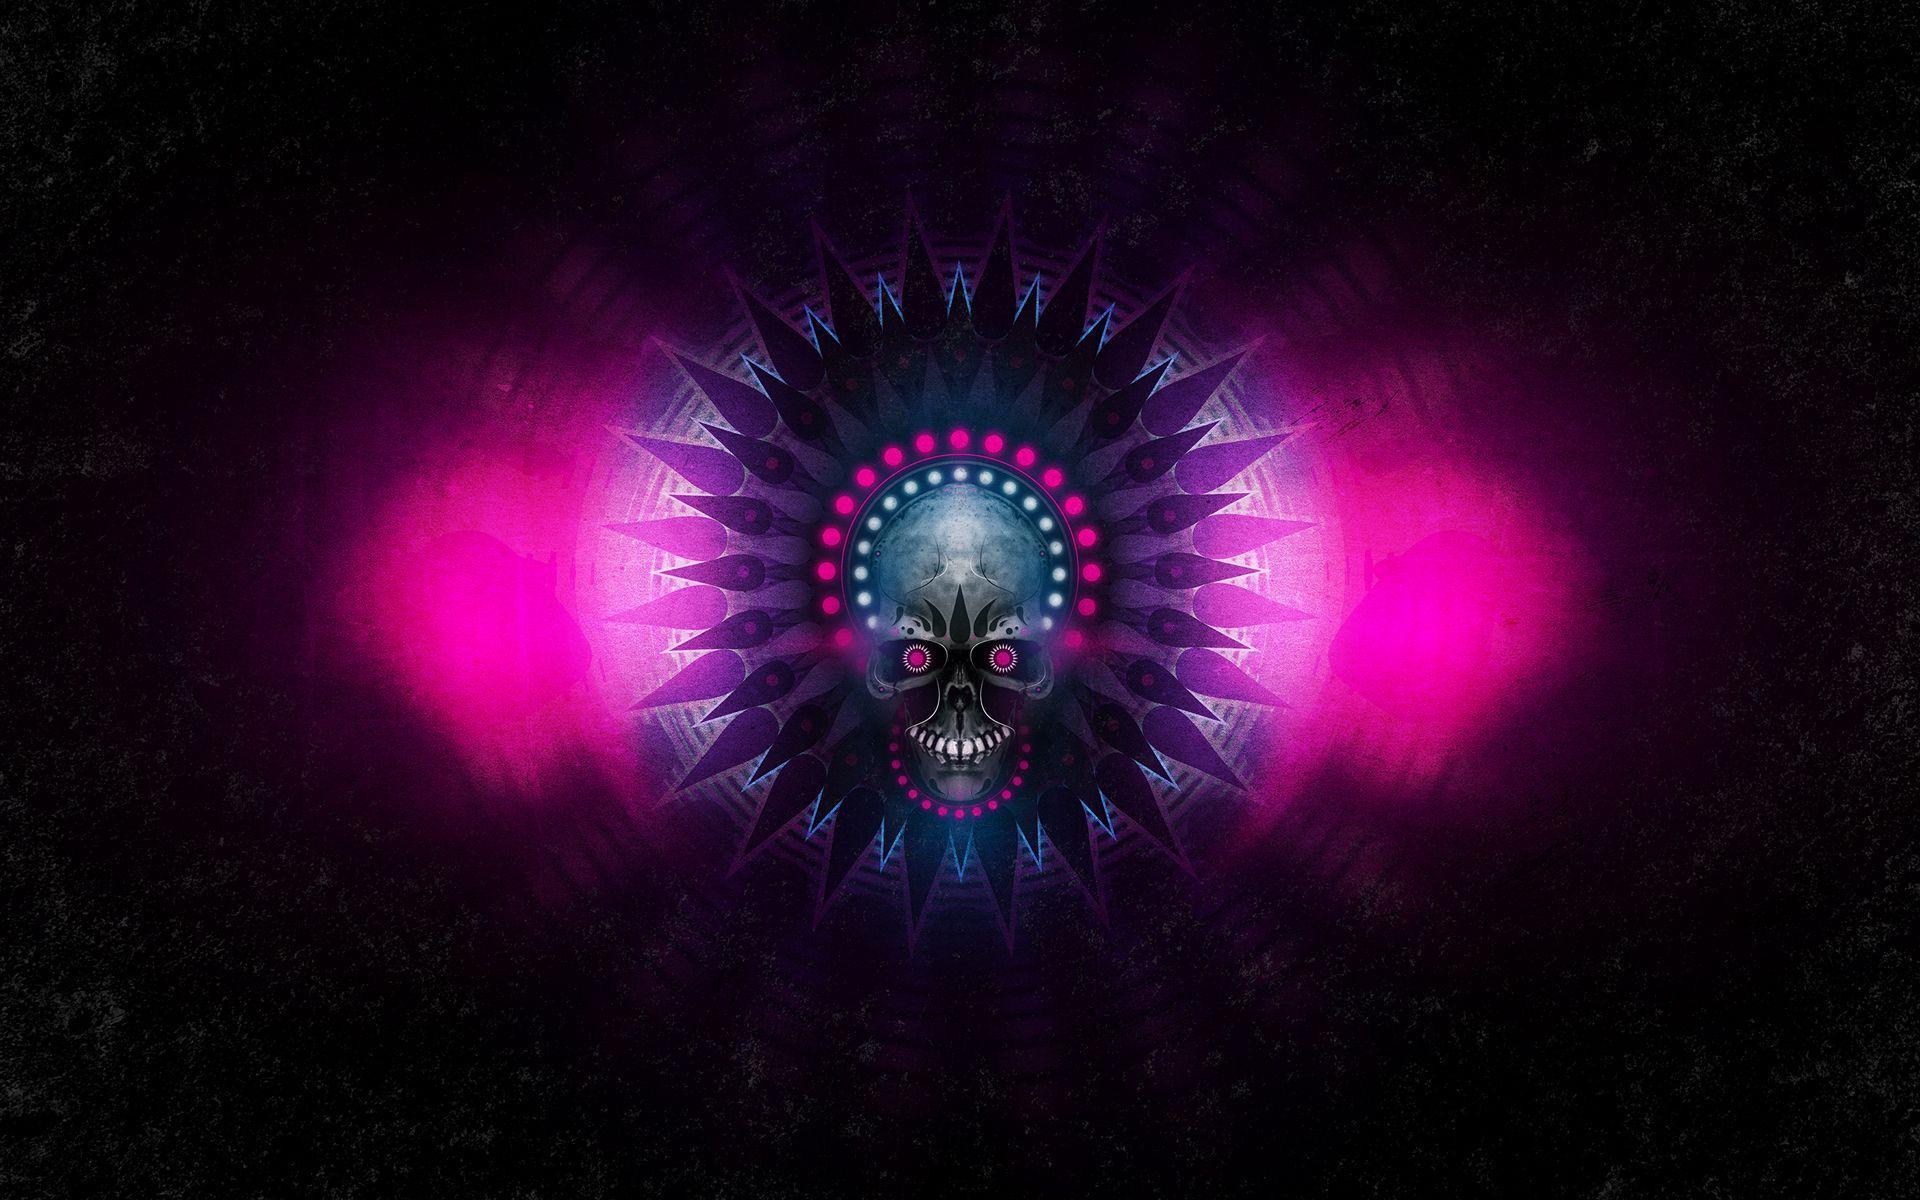 1920x1200 Skull And Music Graffiti Psychedelic Trippy Color Dark